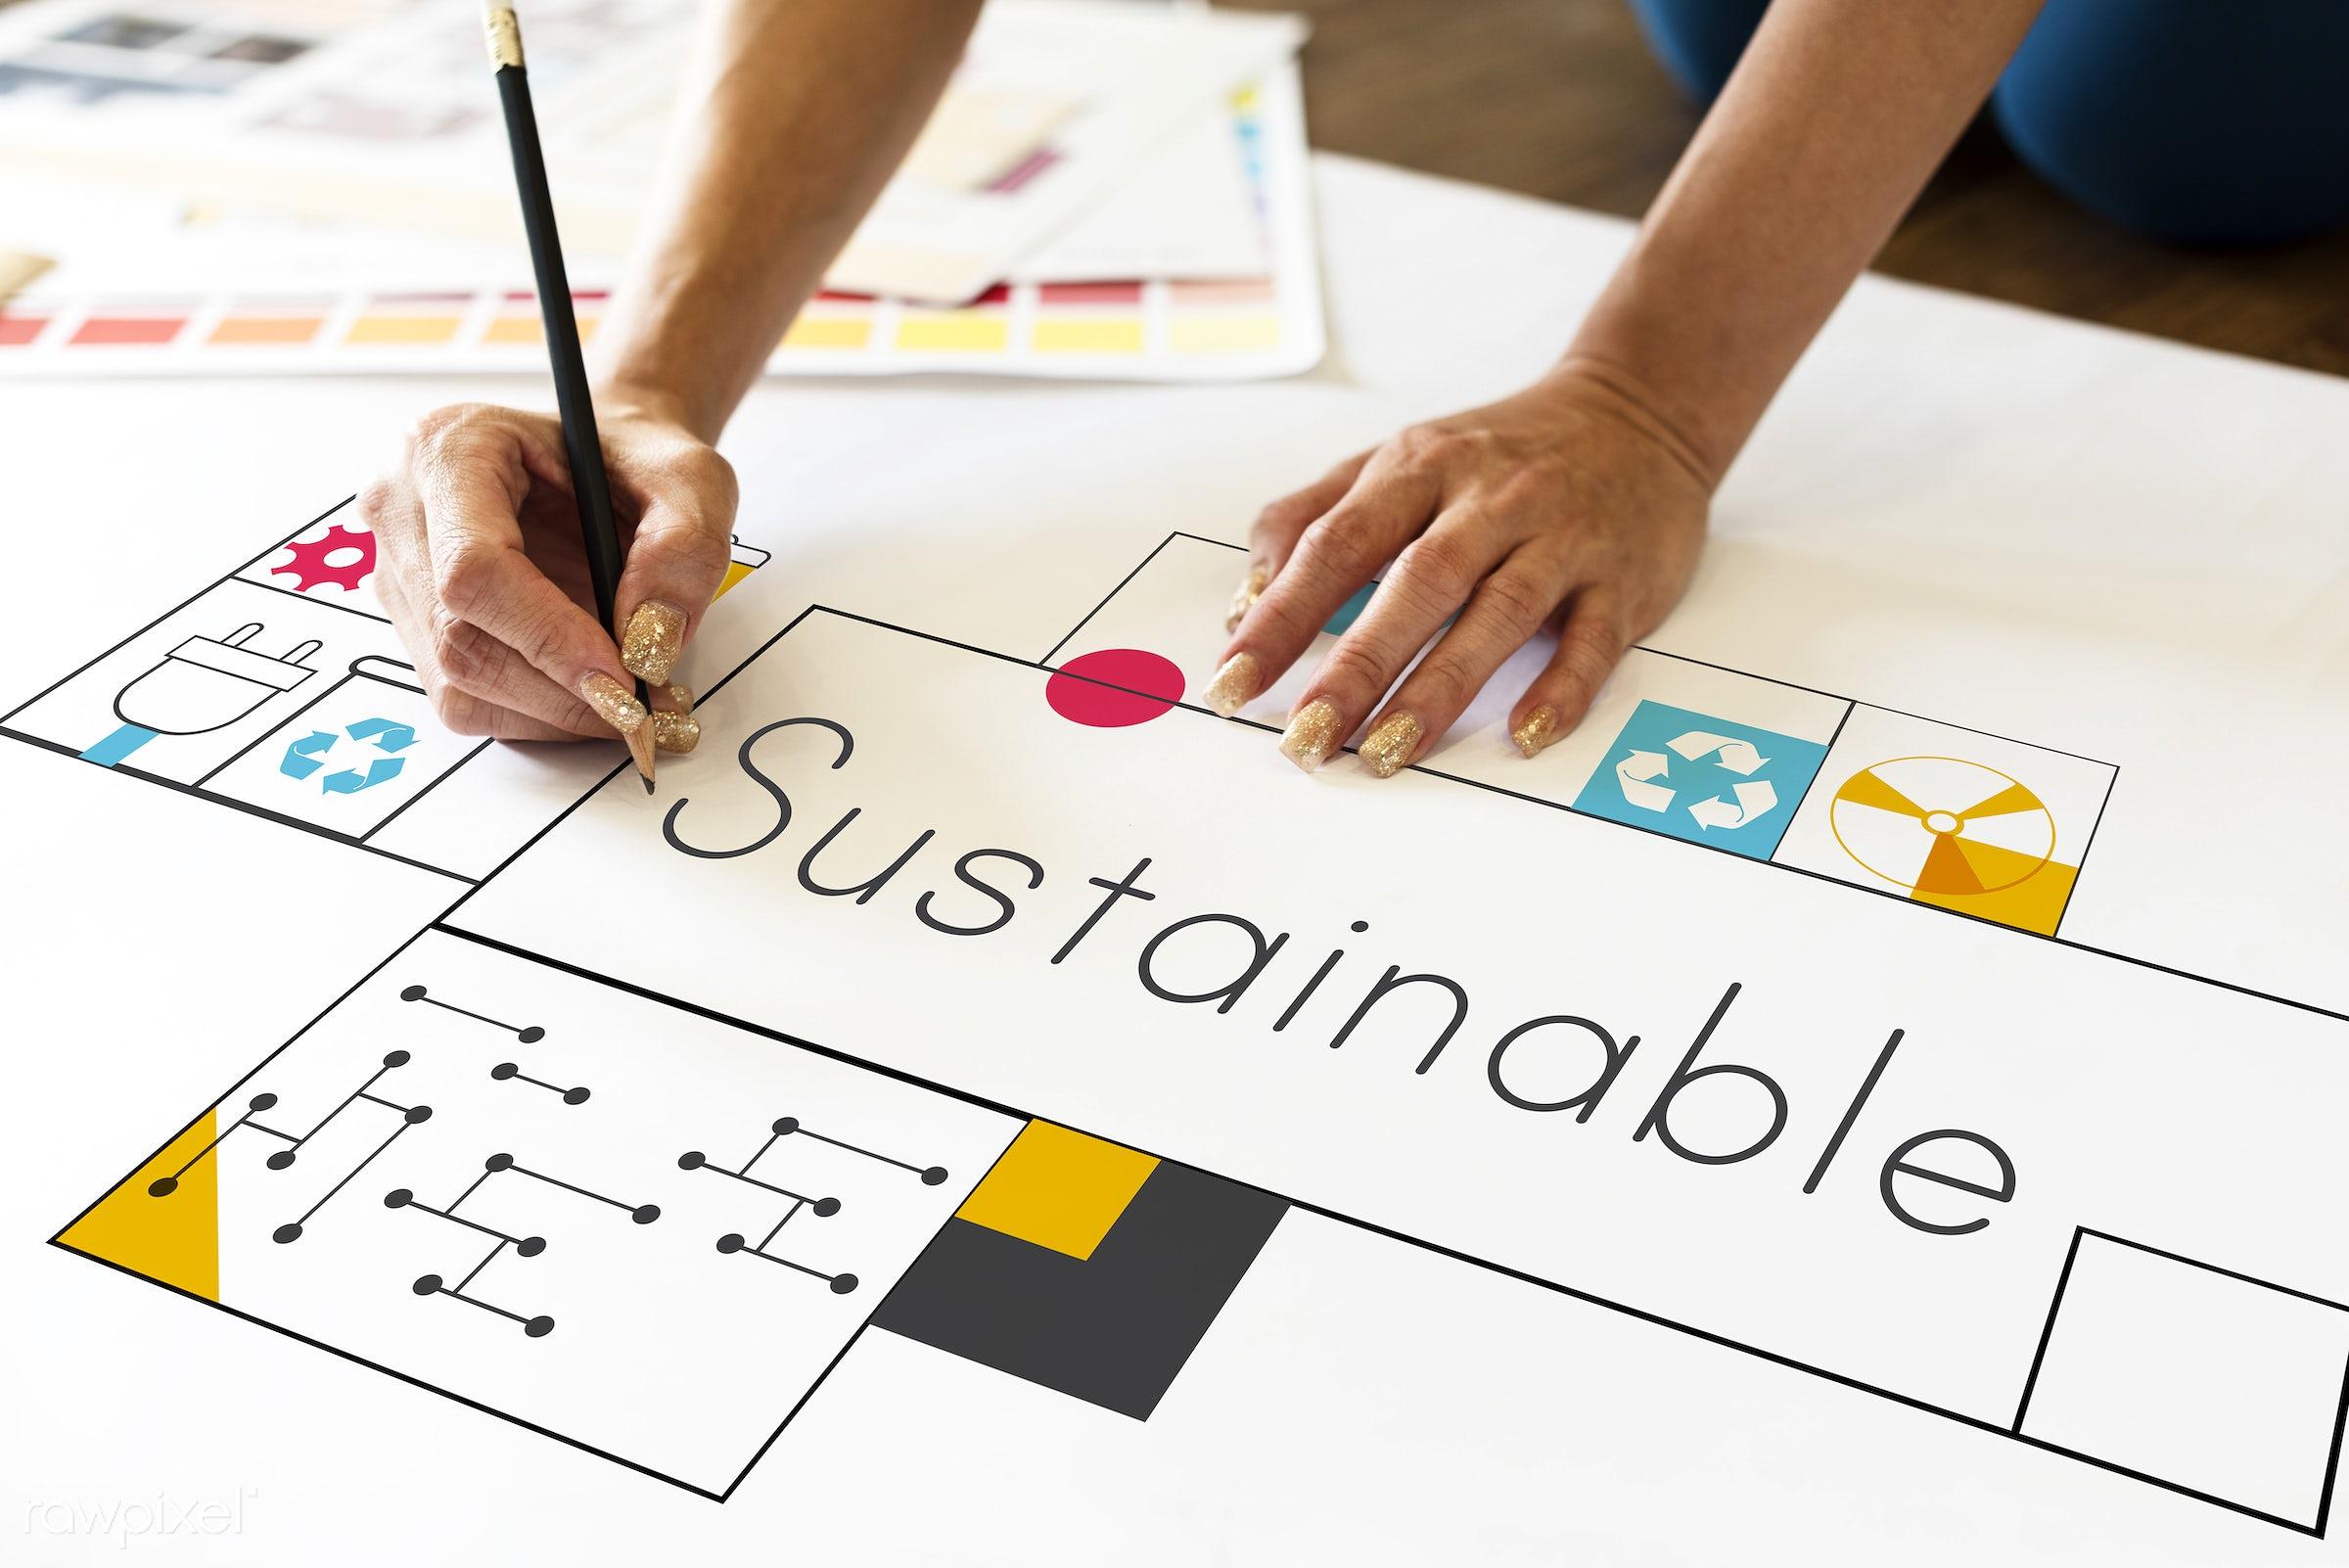 art, business, cloud, communication, connection, control, creation, creative, creativity, data, database, design, digital,...